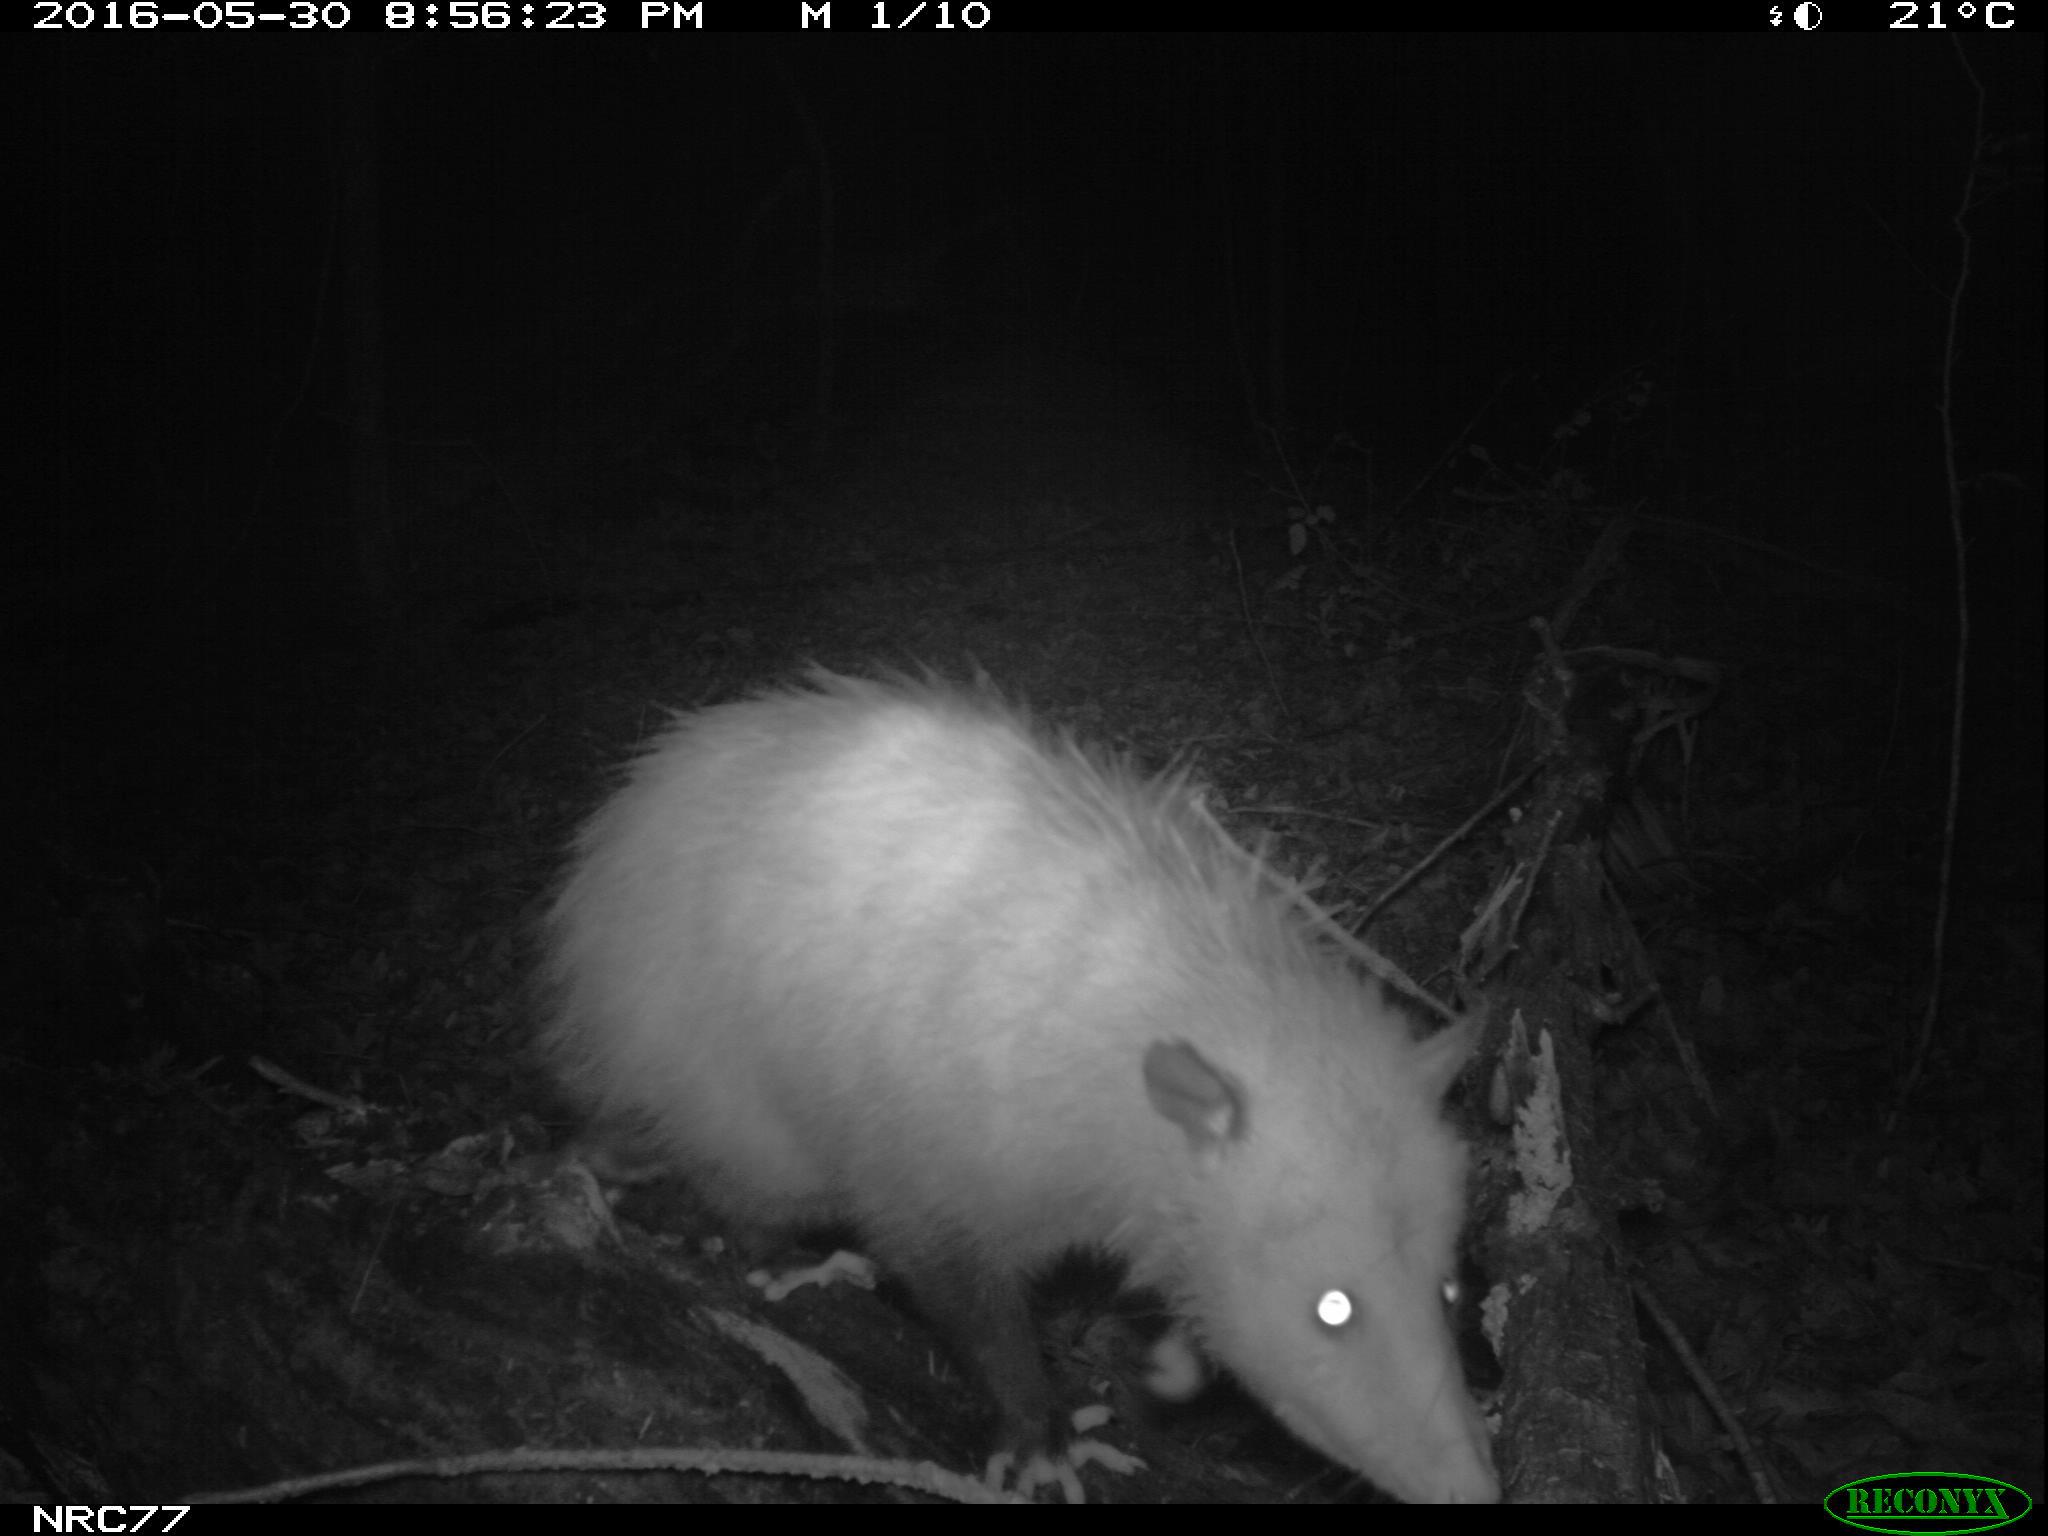 Opossum on camera trap